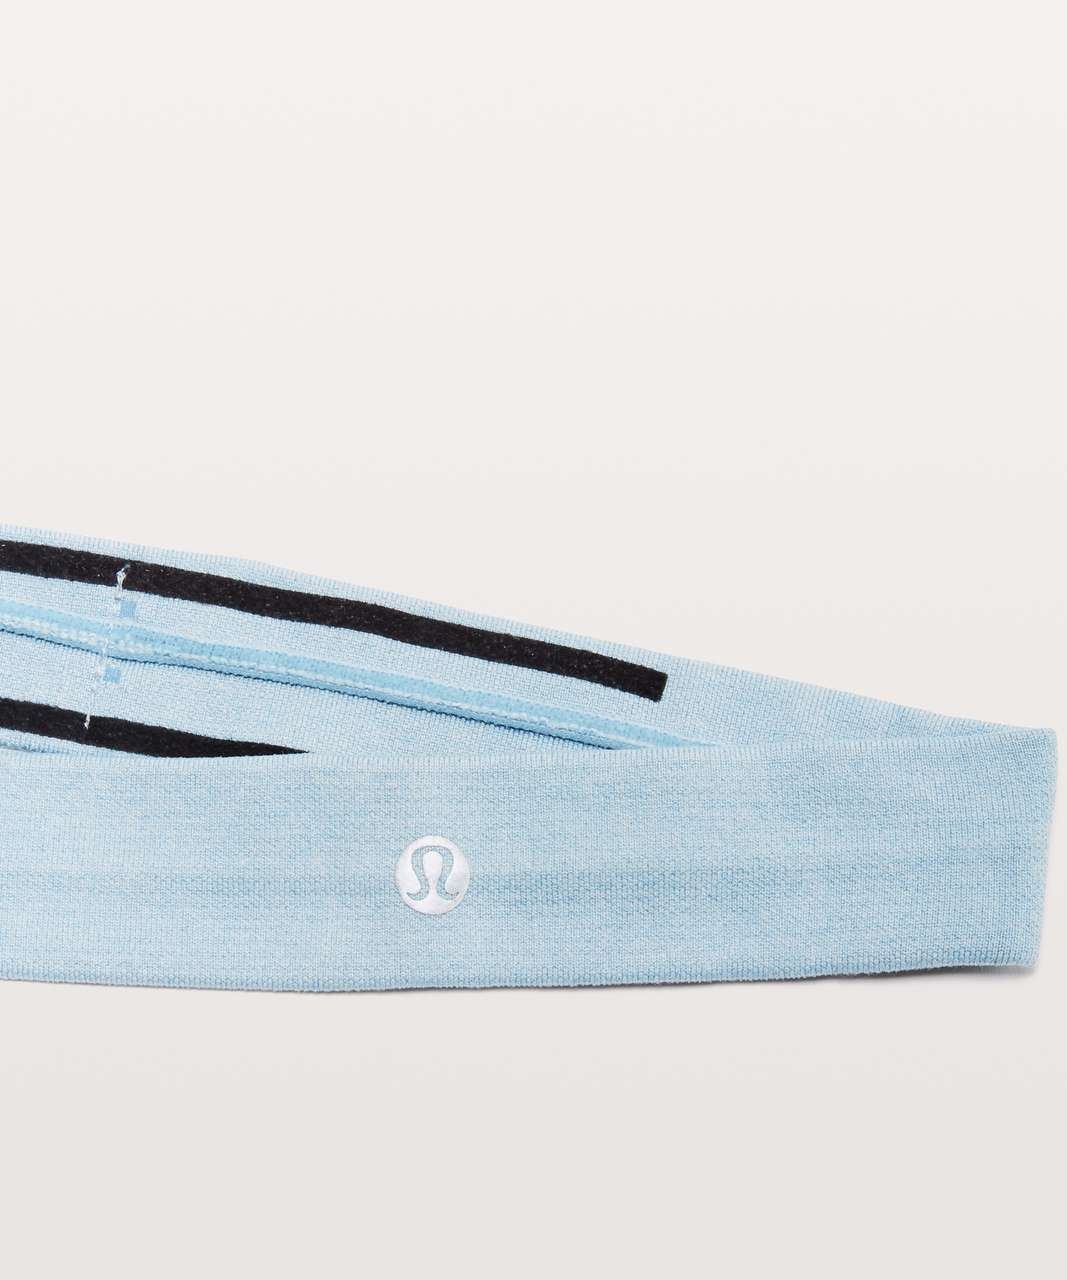 Lululemon Cardio Cross Trainer Headband - Cascade Blue / White